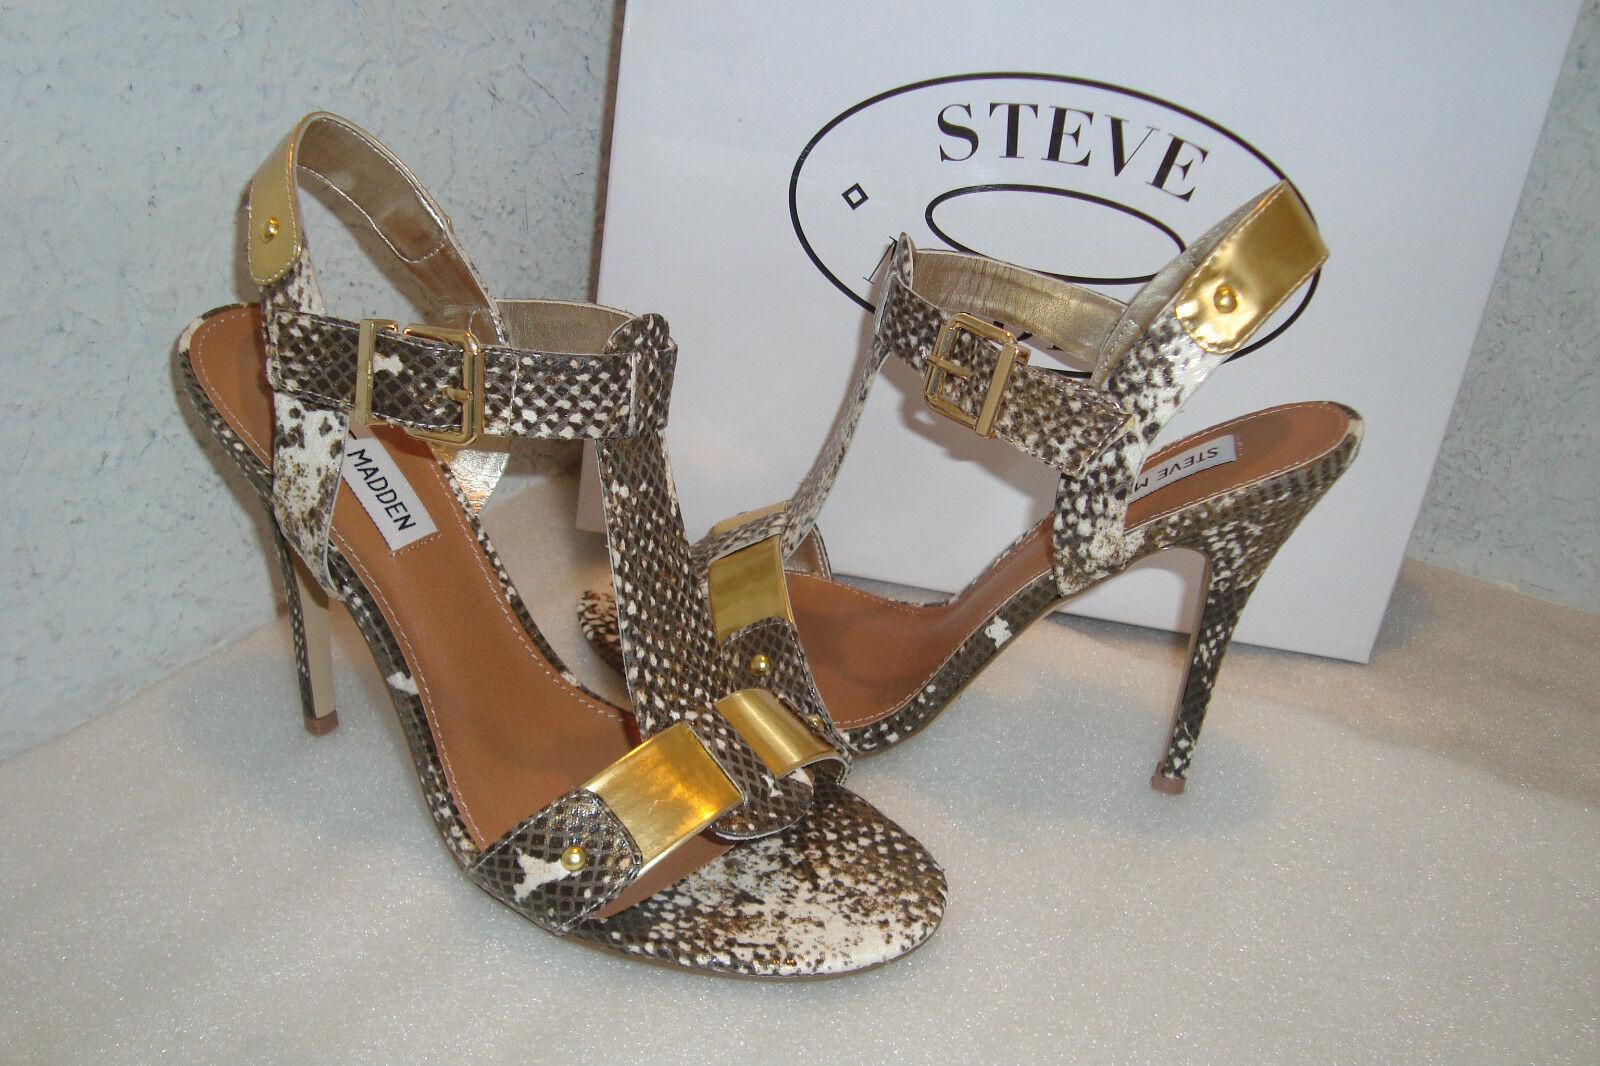 Steve Madden Damenschuhe NWB Reya Natural Snake Sandales Schuhes 9 MED NEU